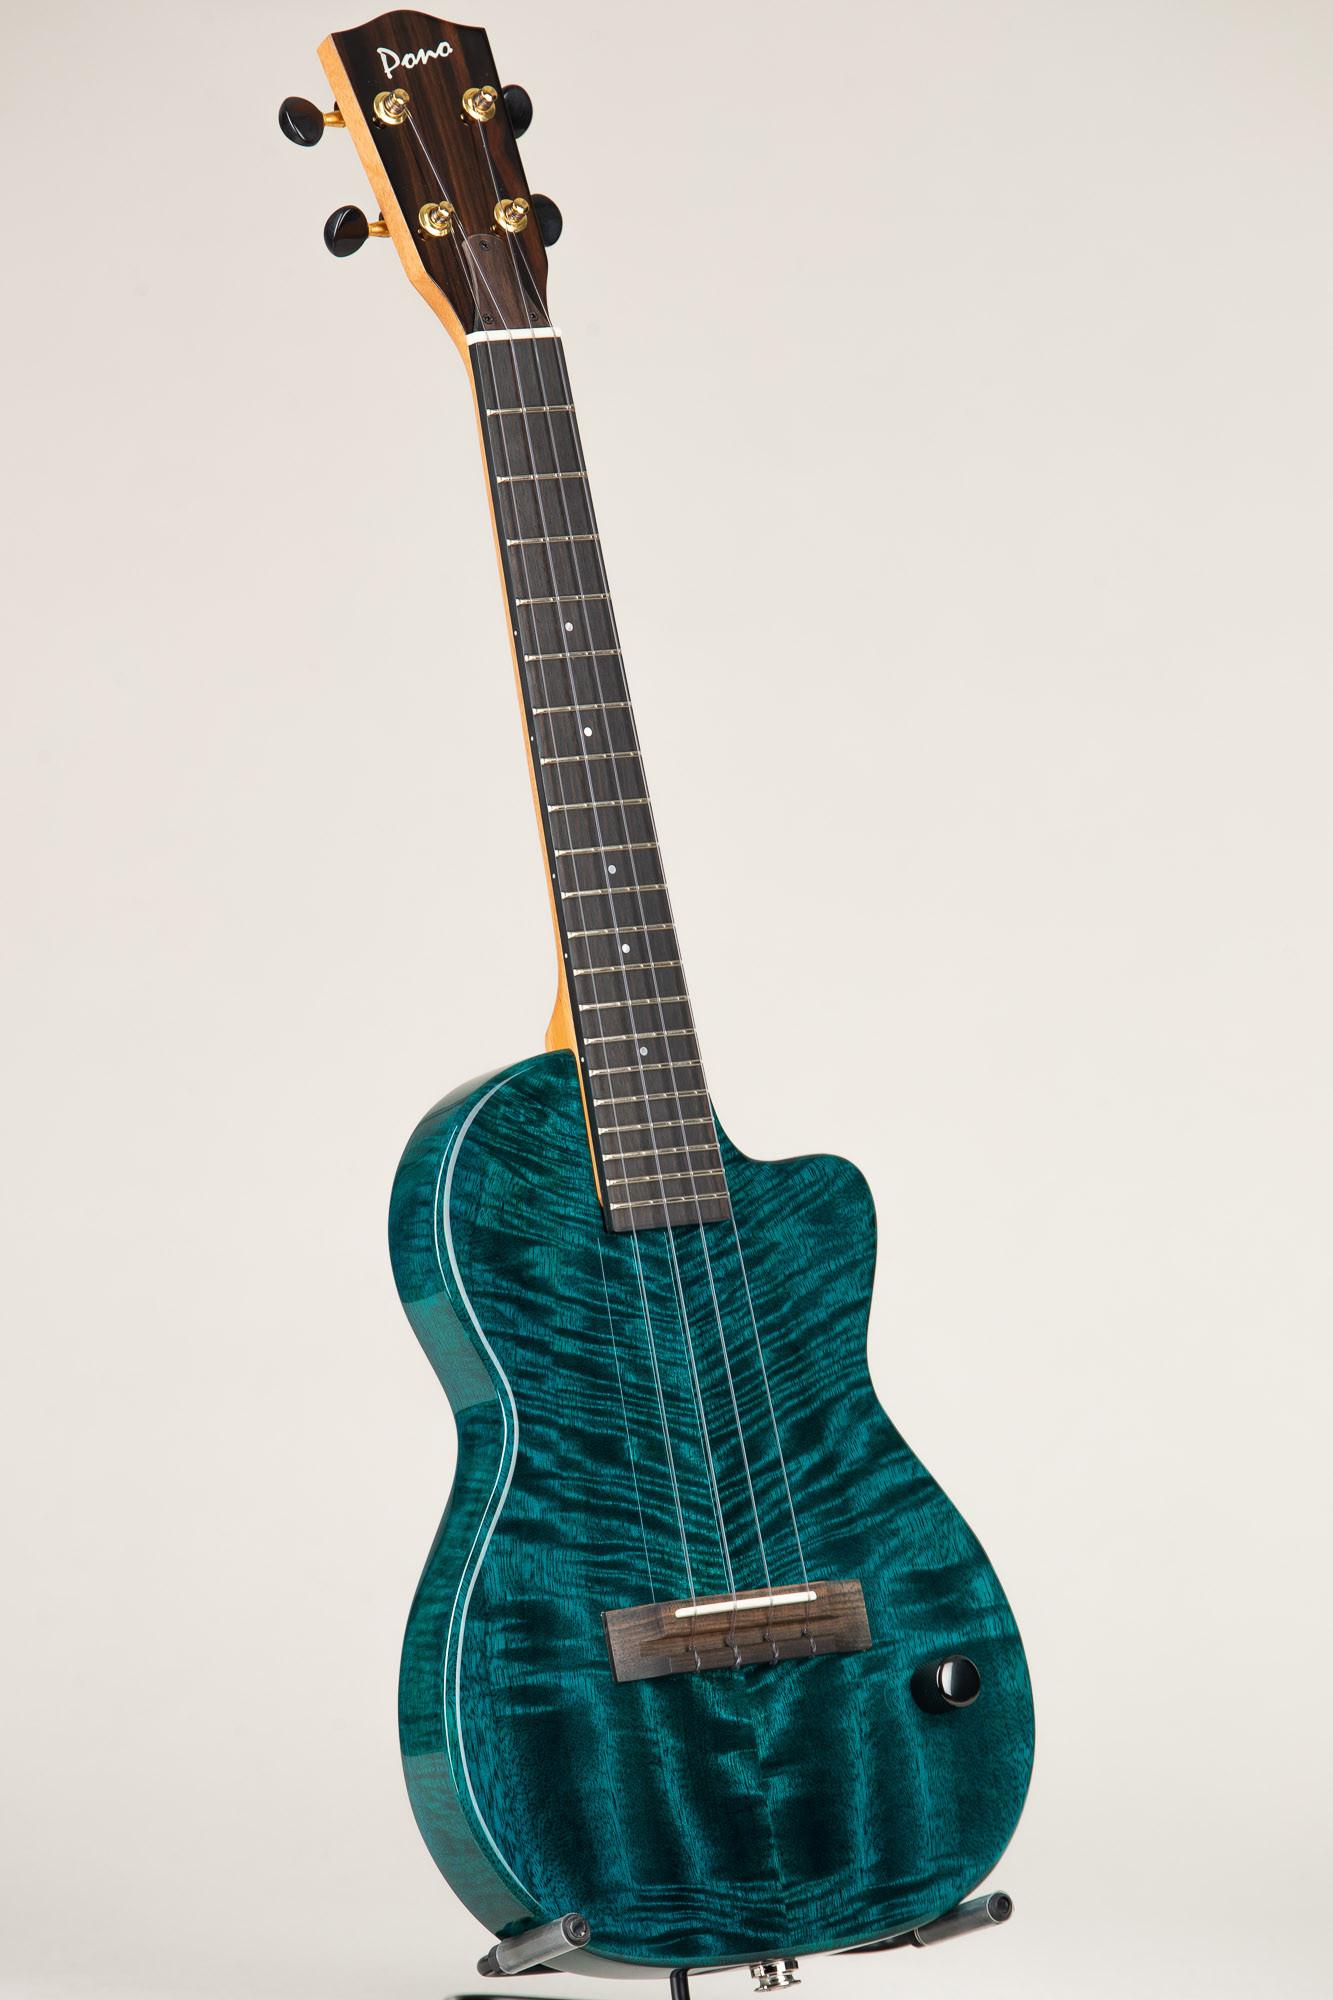 Pono Tenor Electric Mango Deluxe LE (TE-MDB 4381)